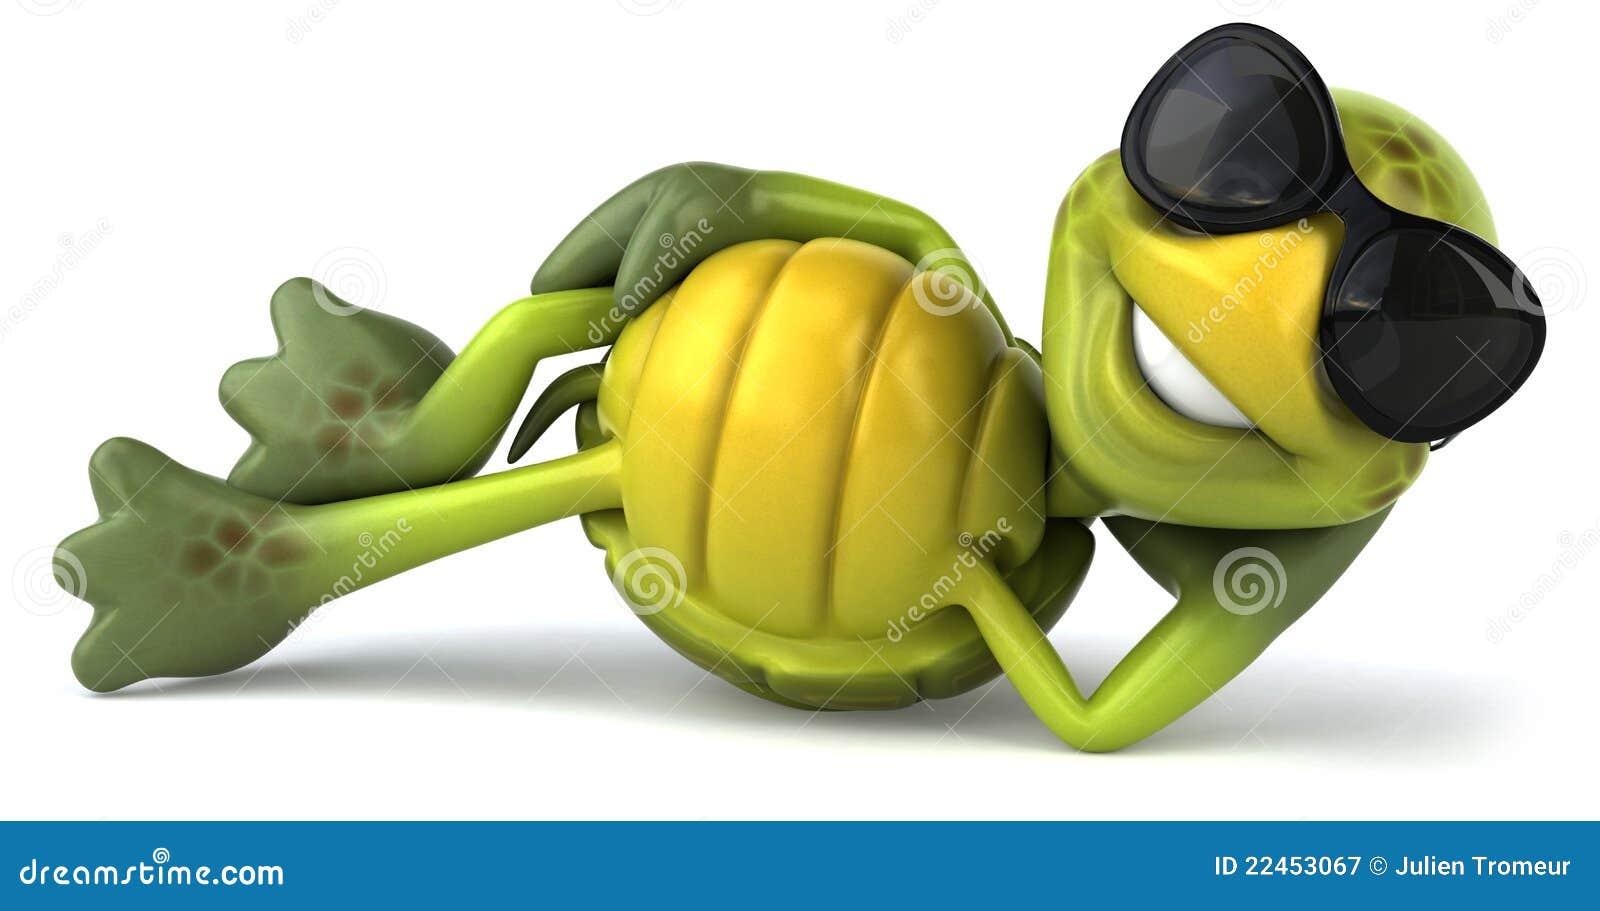 Fun Turtle Royalty Free Stock Photography Image 22453067